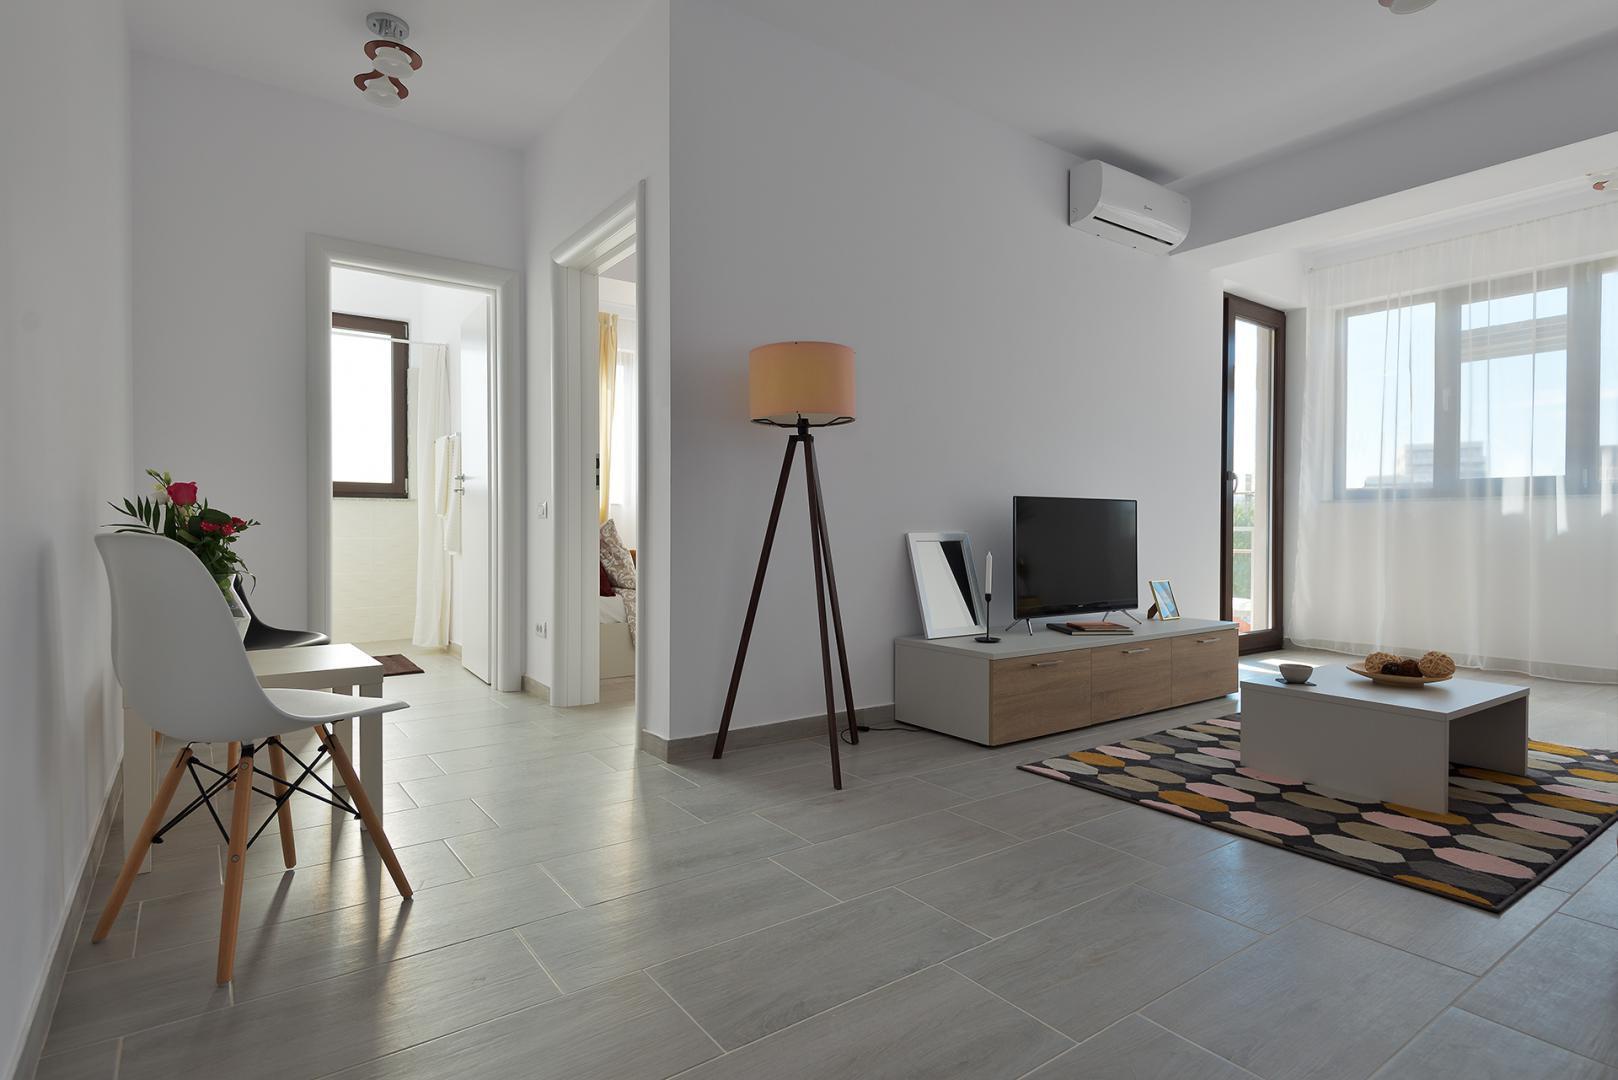 2 Camere | De inchriat | Vitan | Mihai Bravu | Metrou | Nou | Centrala